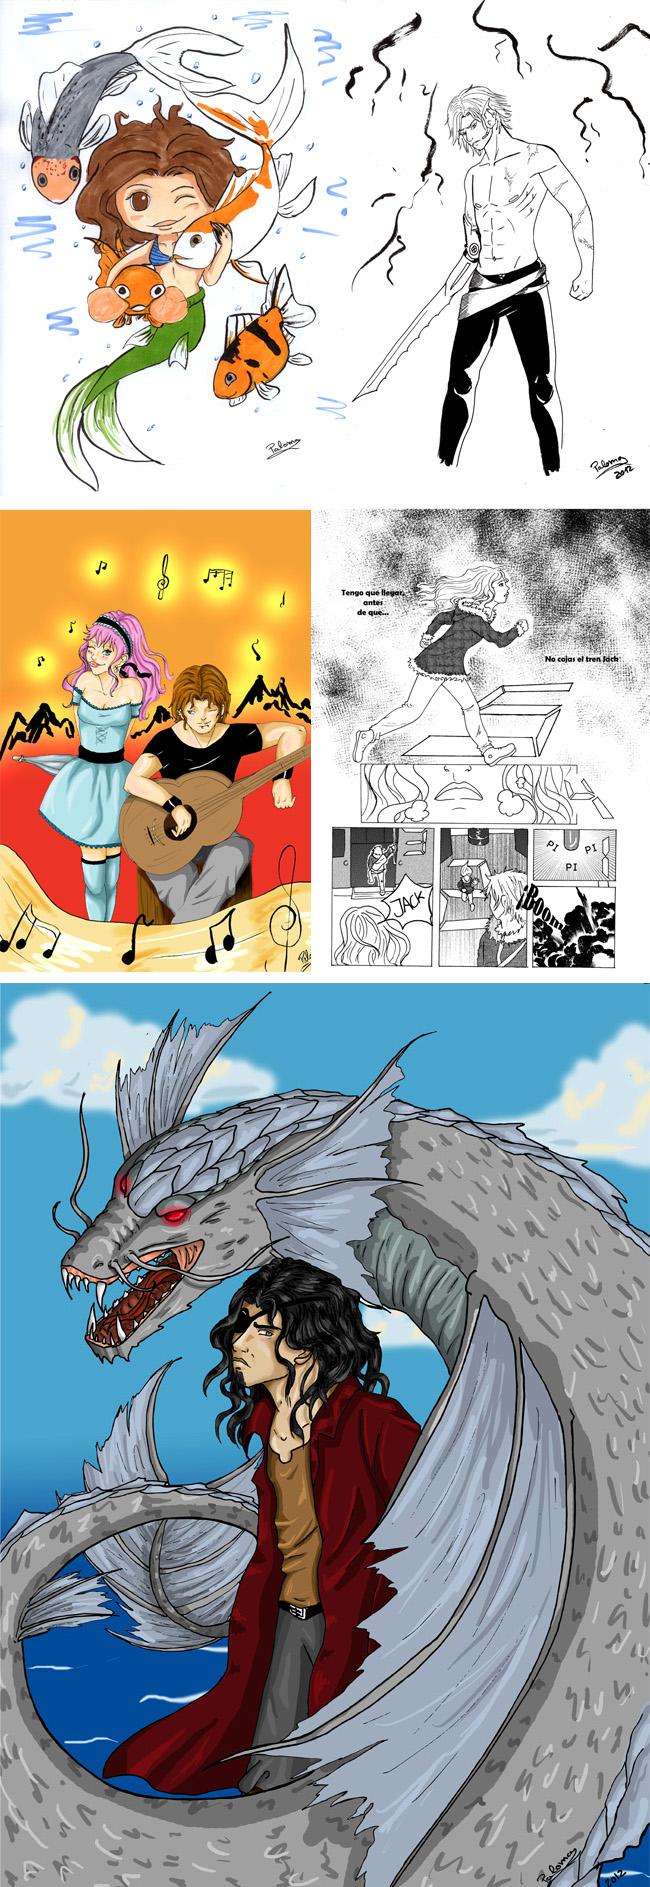 Manga-trabajos-alumnos-aprender-dibujo-madrid-AcademiaC10